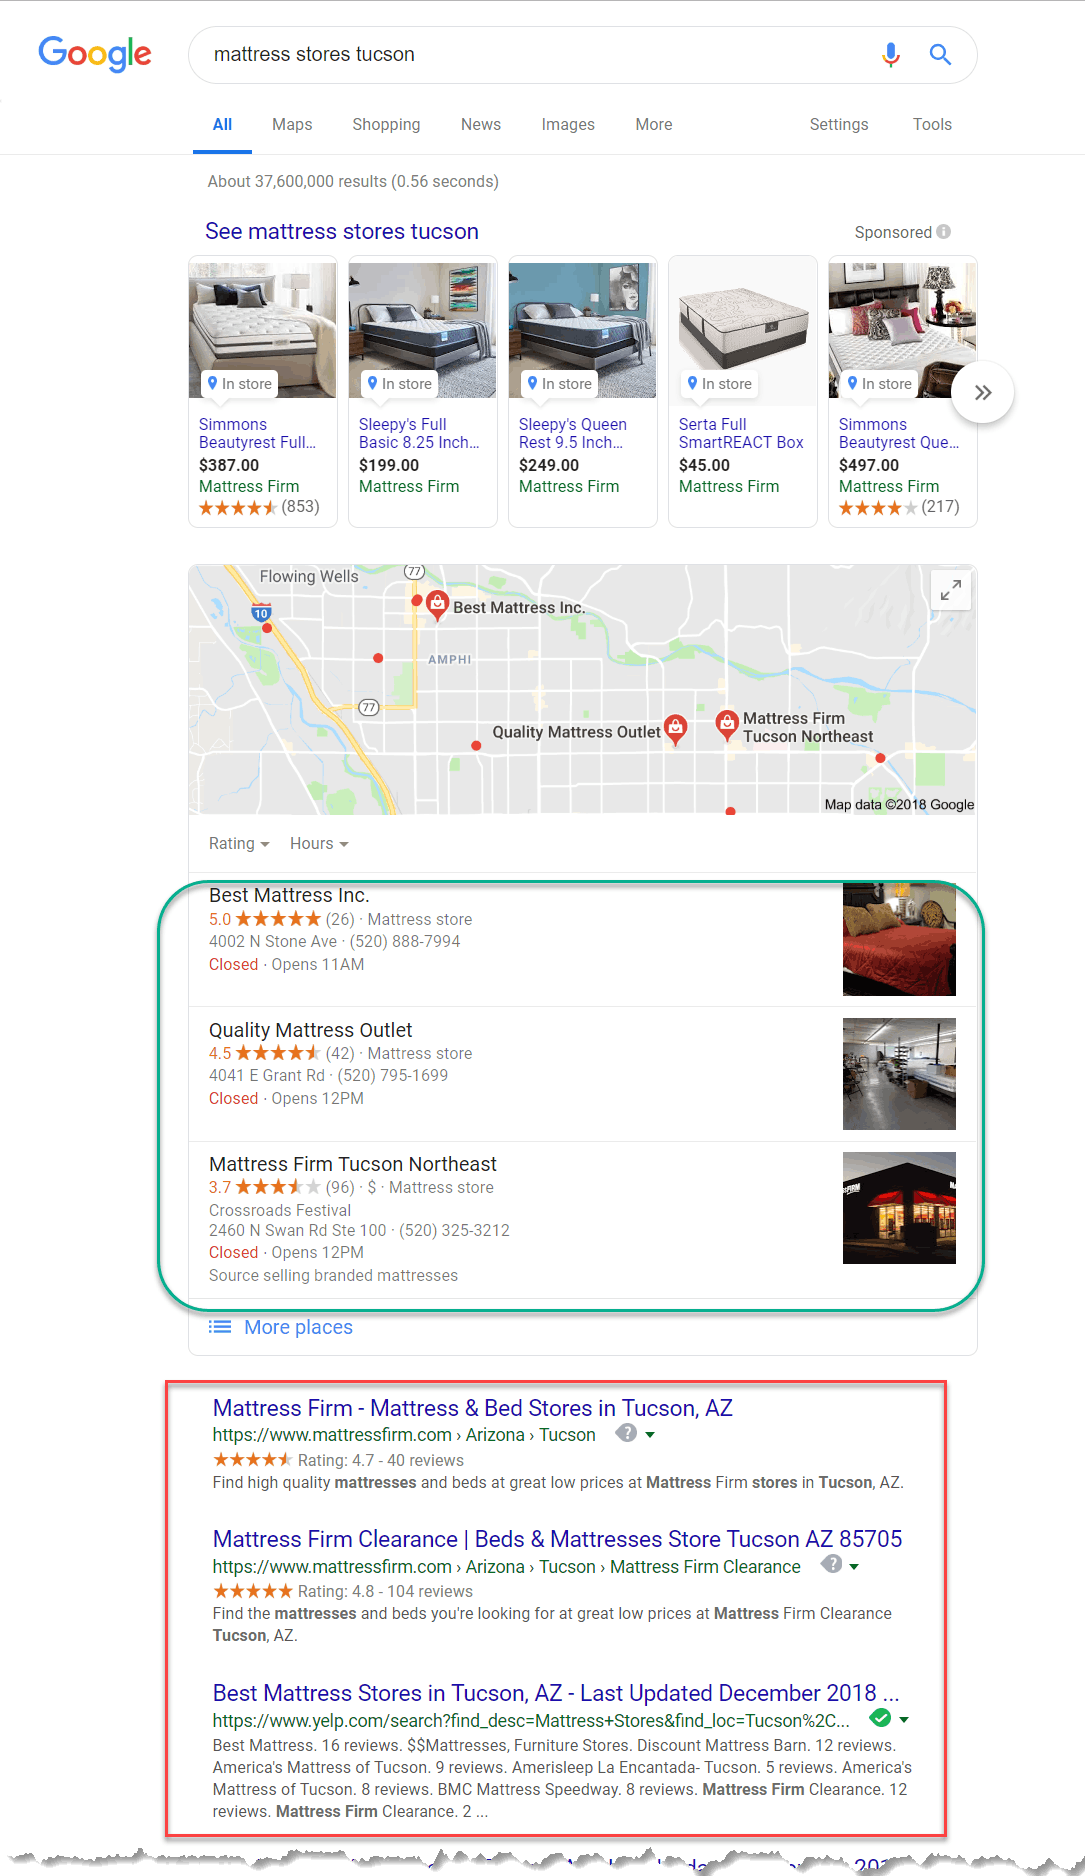 mattress stores Tucson Google Search image